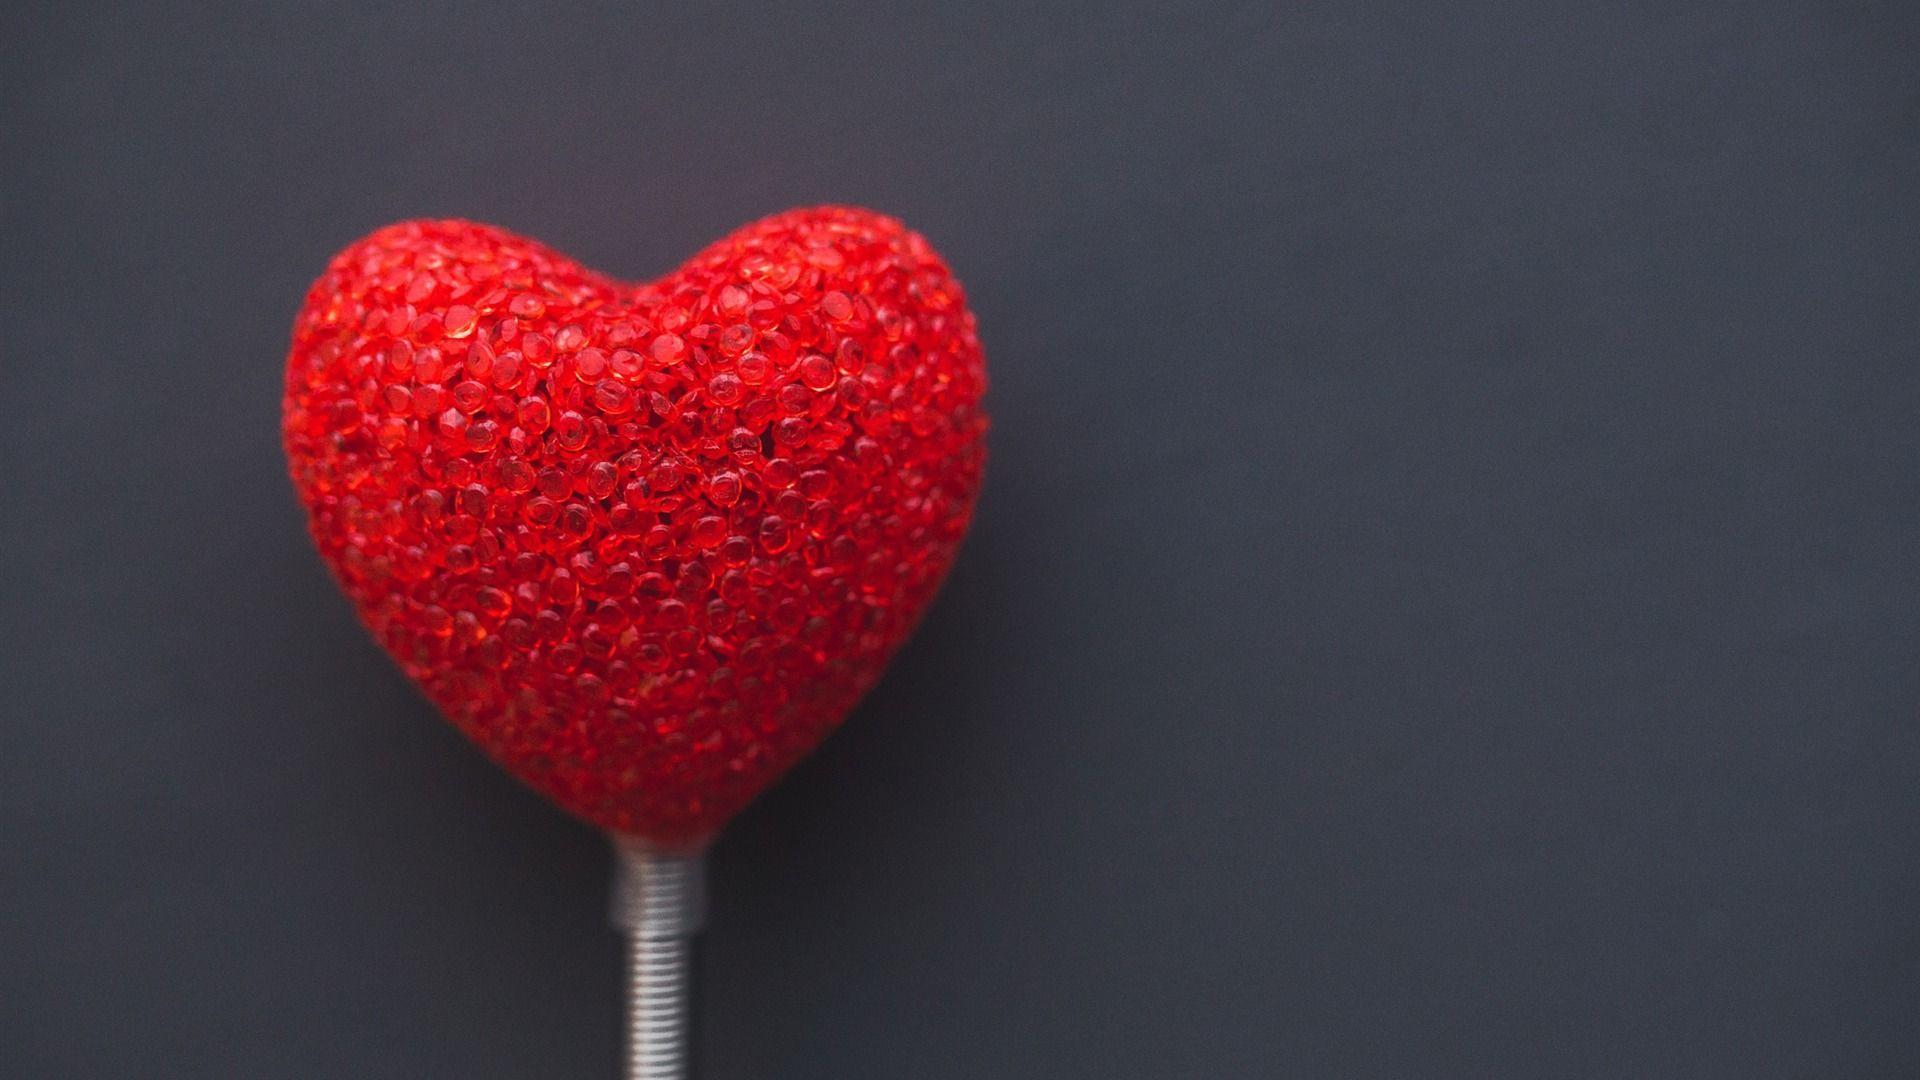 Heart background wallpaper